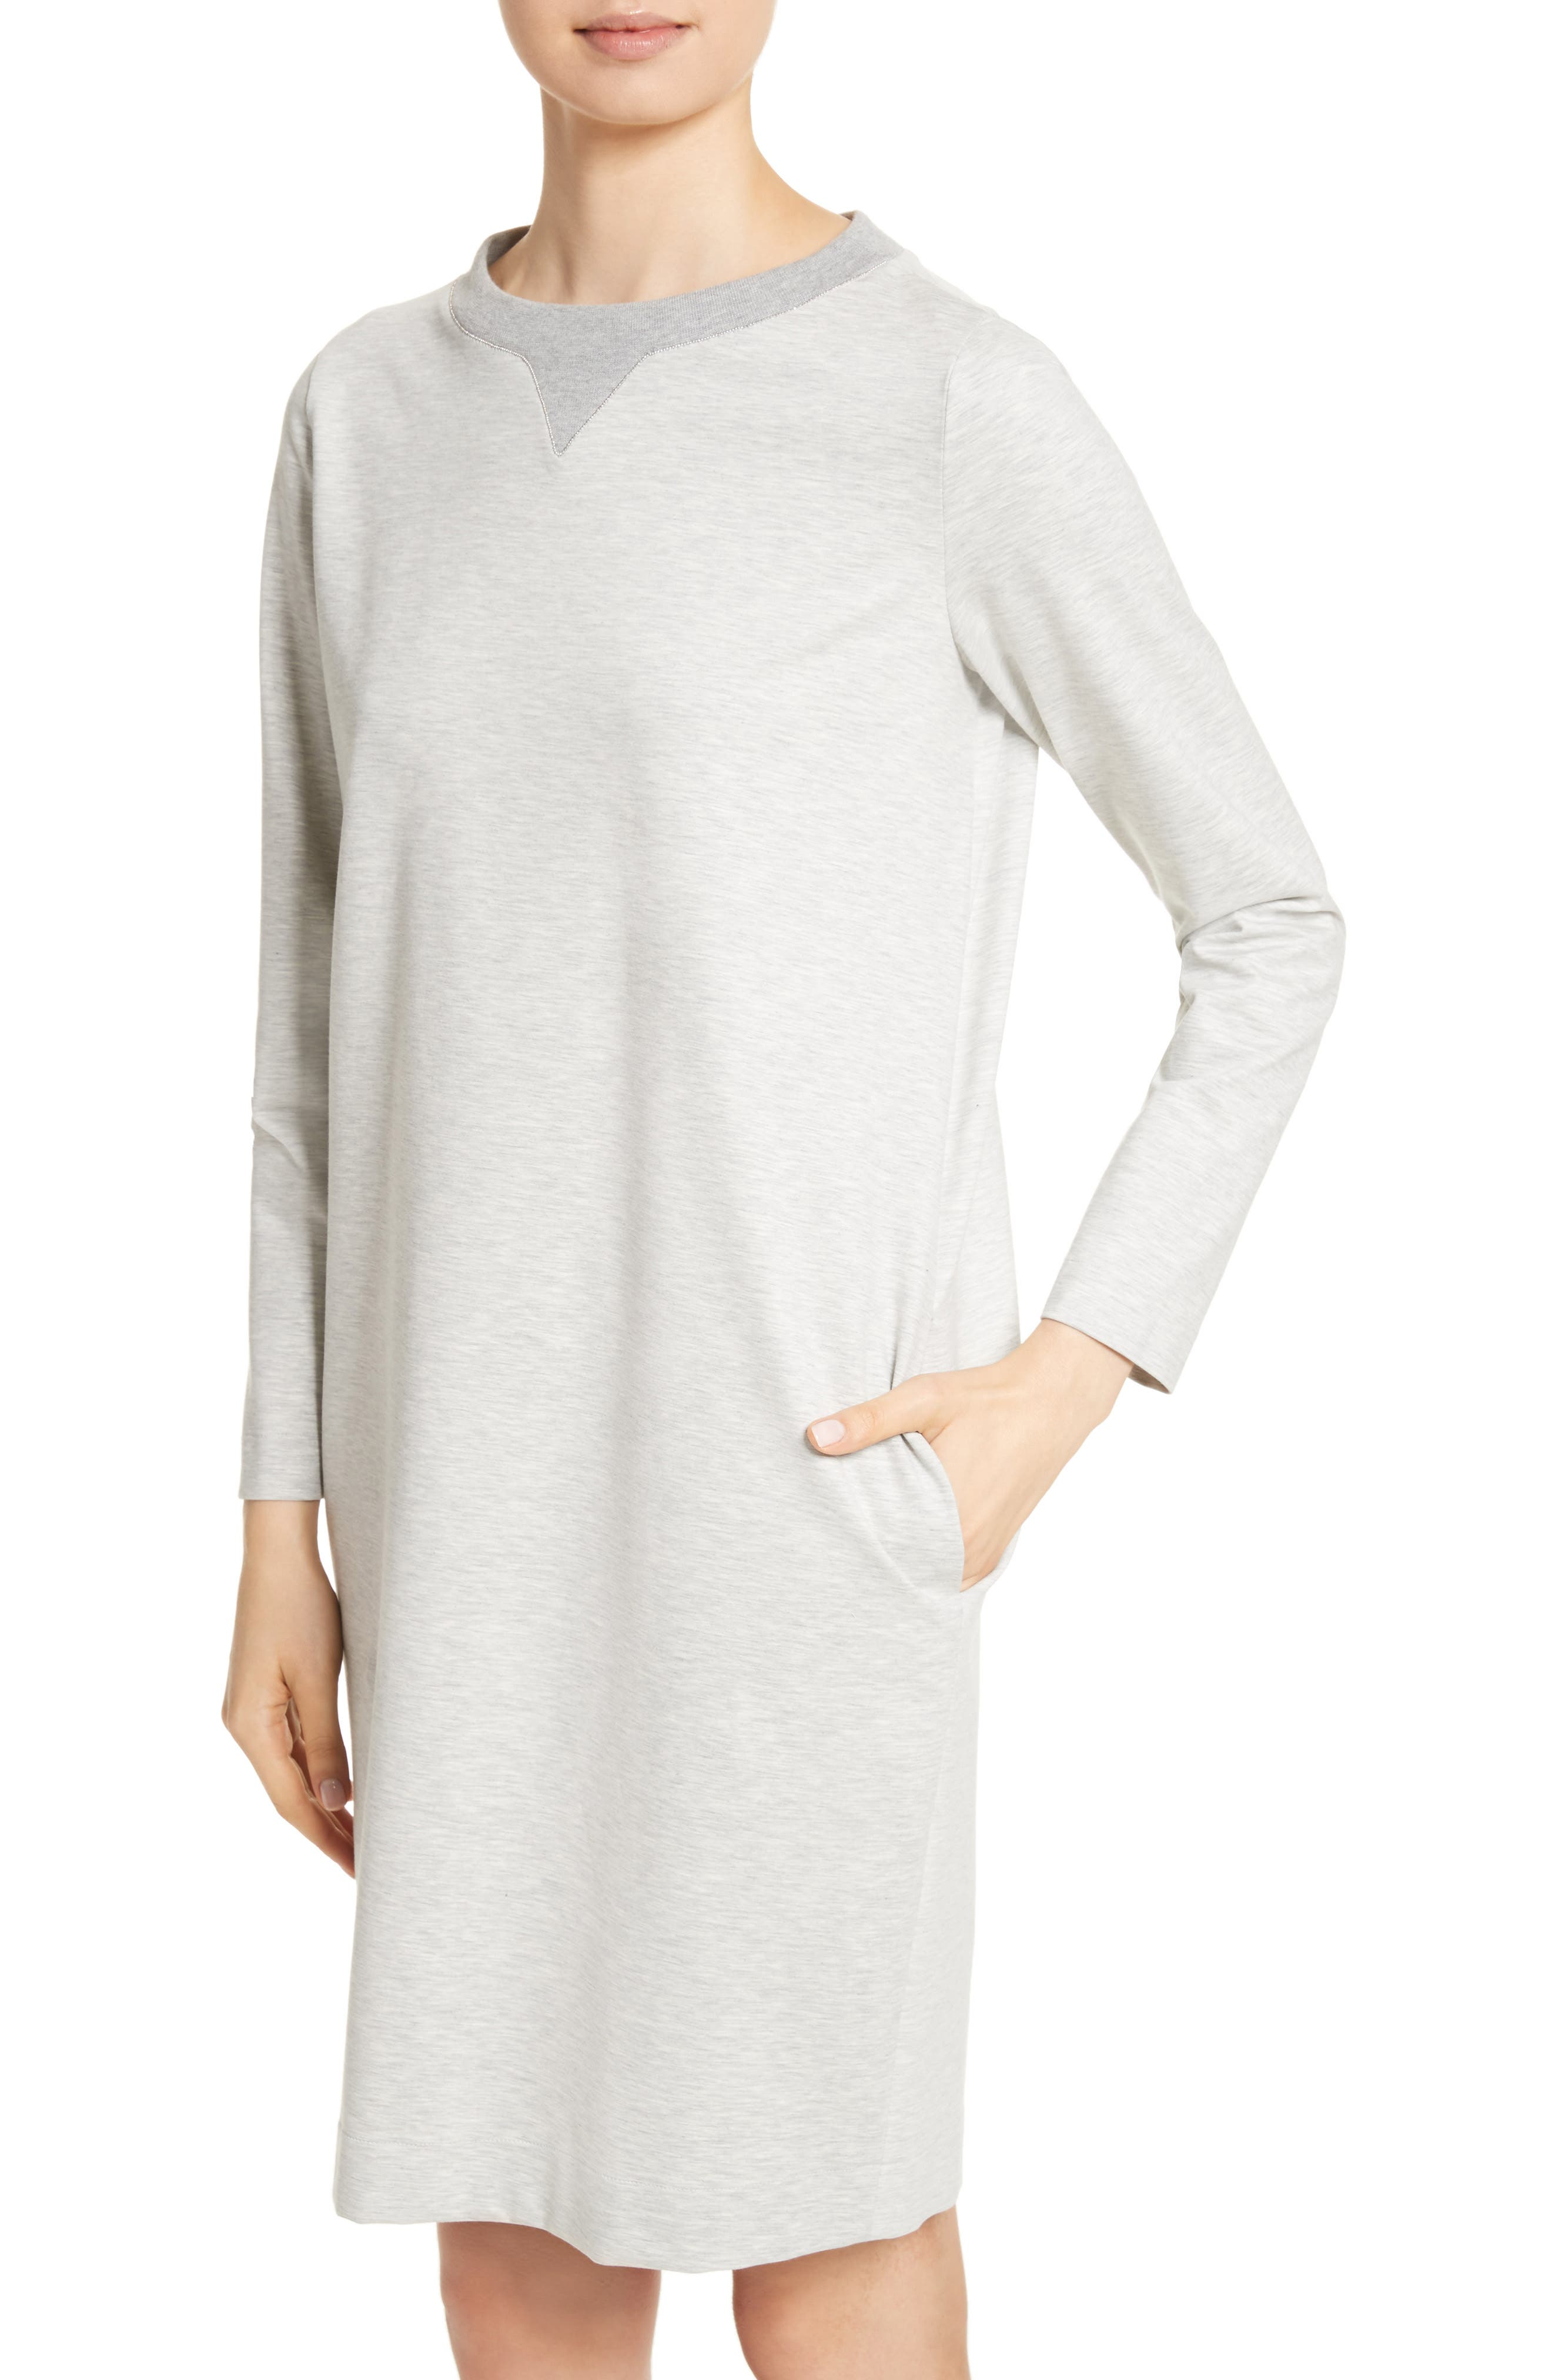 Rodier Jersey Sweatshirt Dress,                             Alternate thumbnail 4, color,                             050